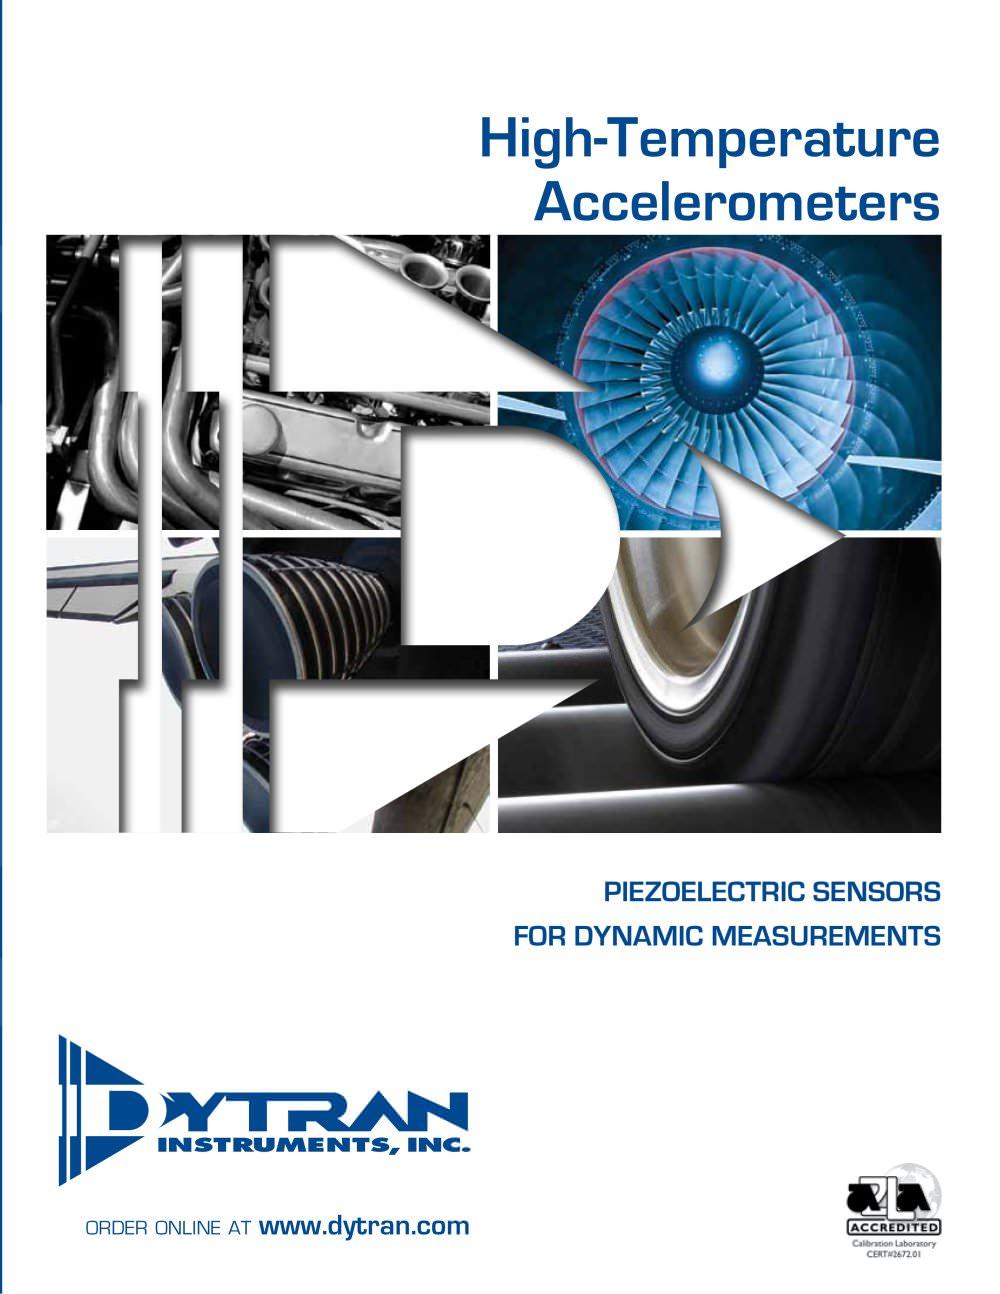 Piezoelectric Accelerometers for High Temperature